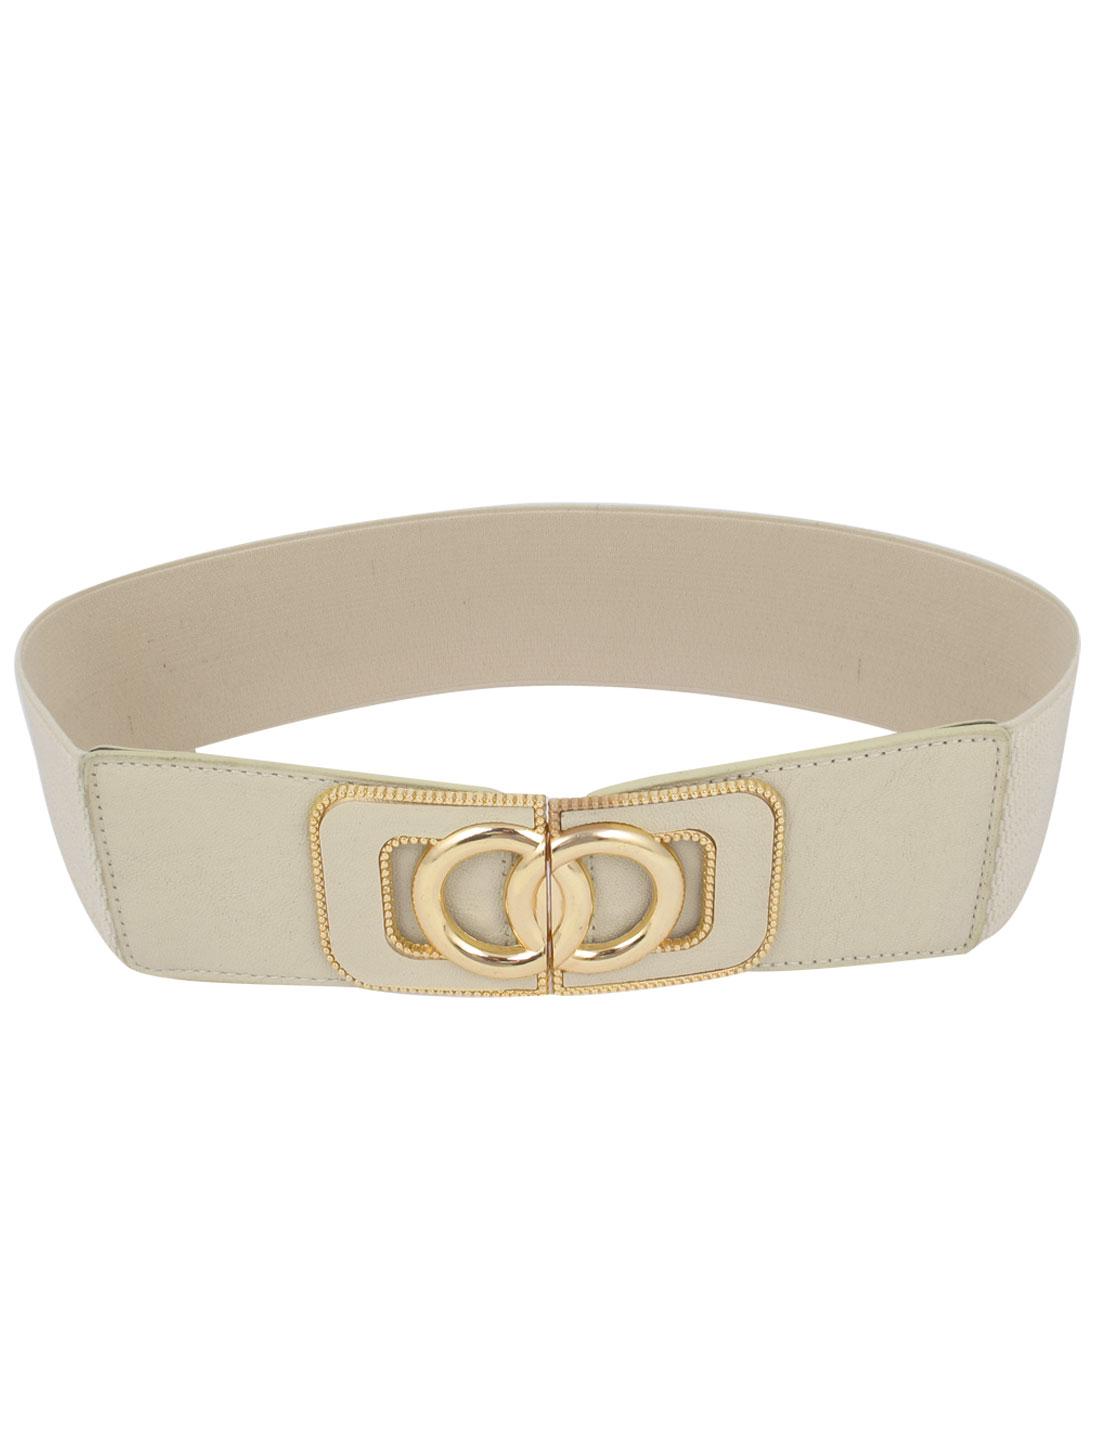 Ladies Metal Mini Beads Detail Gold Tone Interlock Buckle Stretchy Belt Ivory